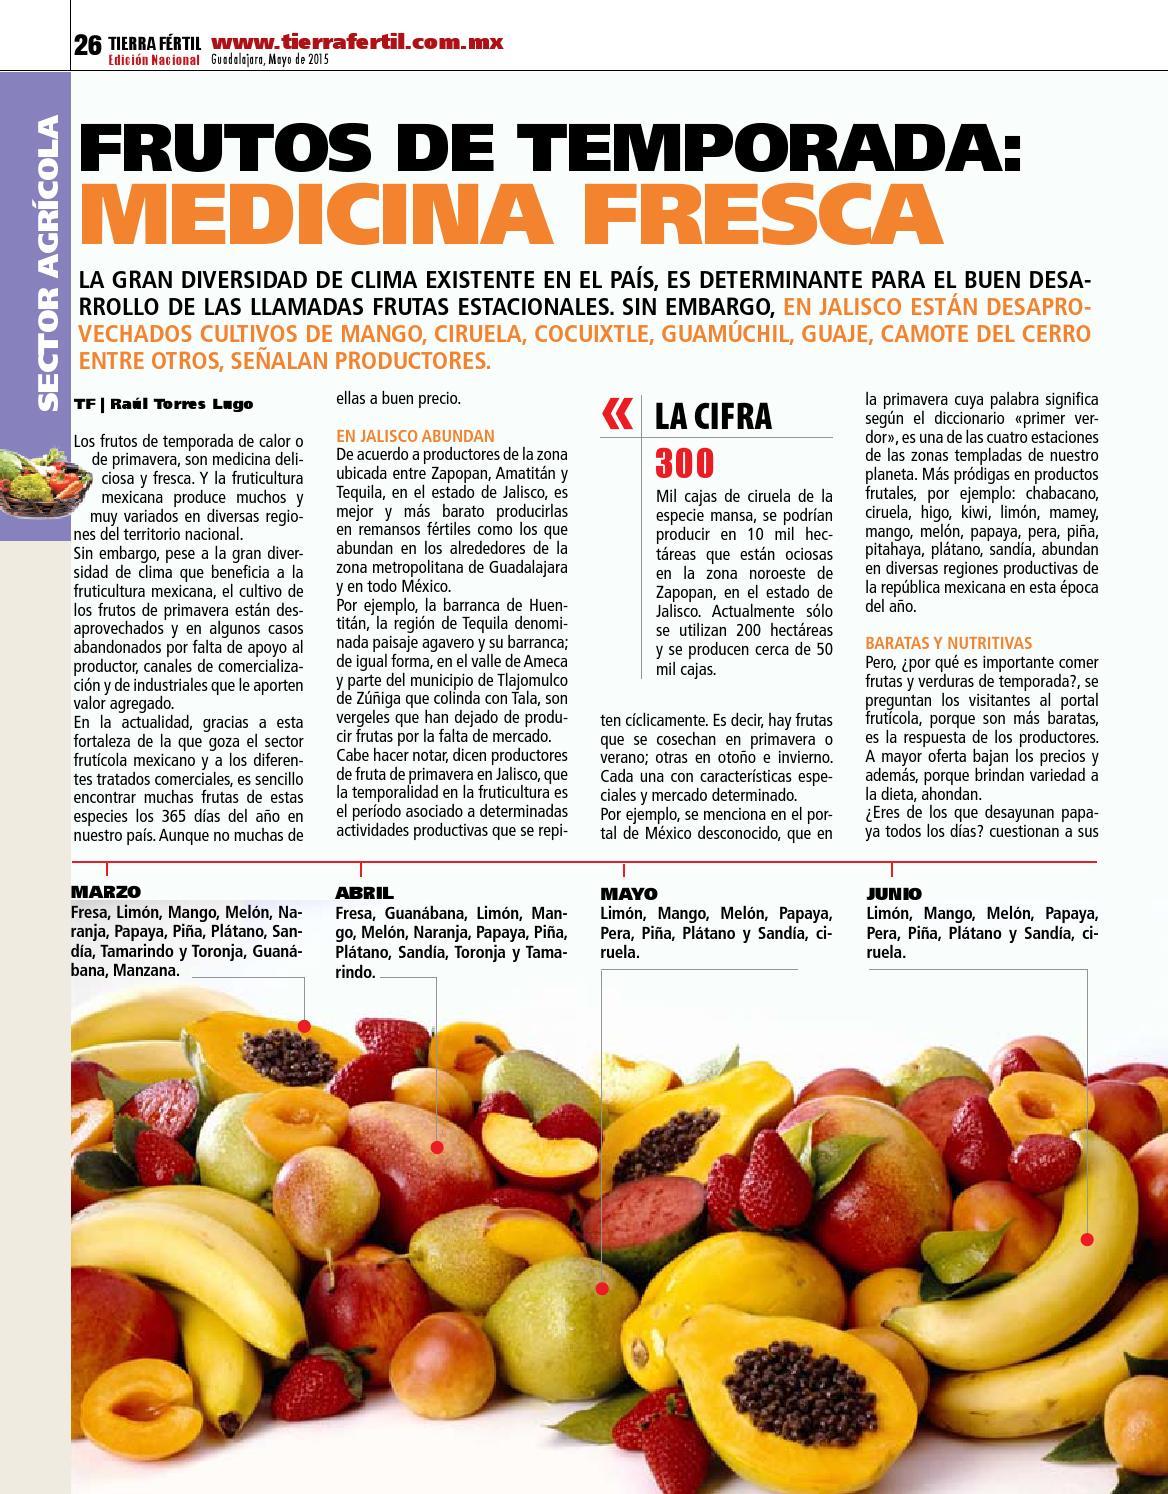 Dieta de papaya pitaya y guanabanas